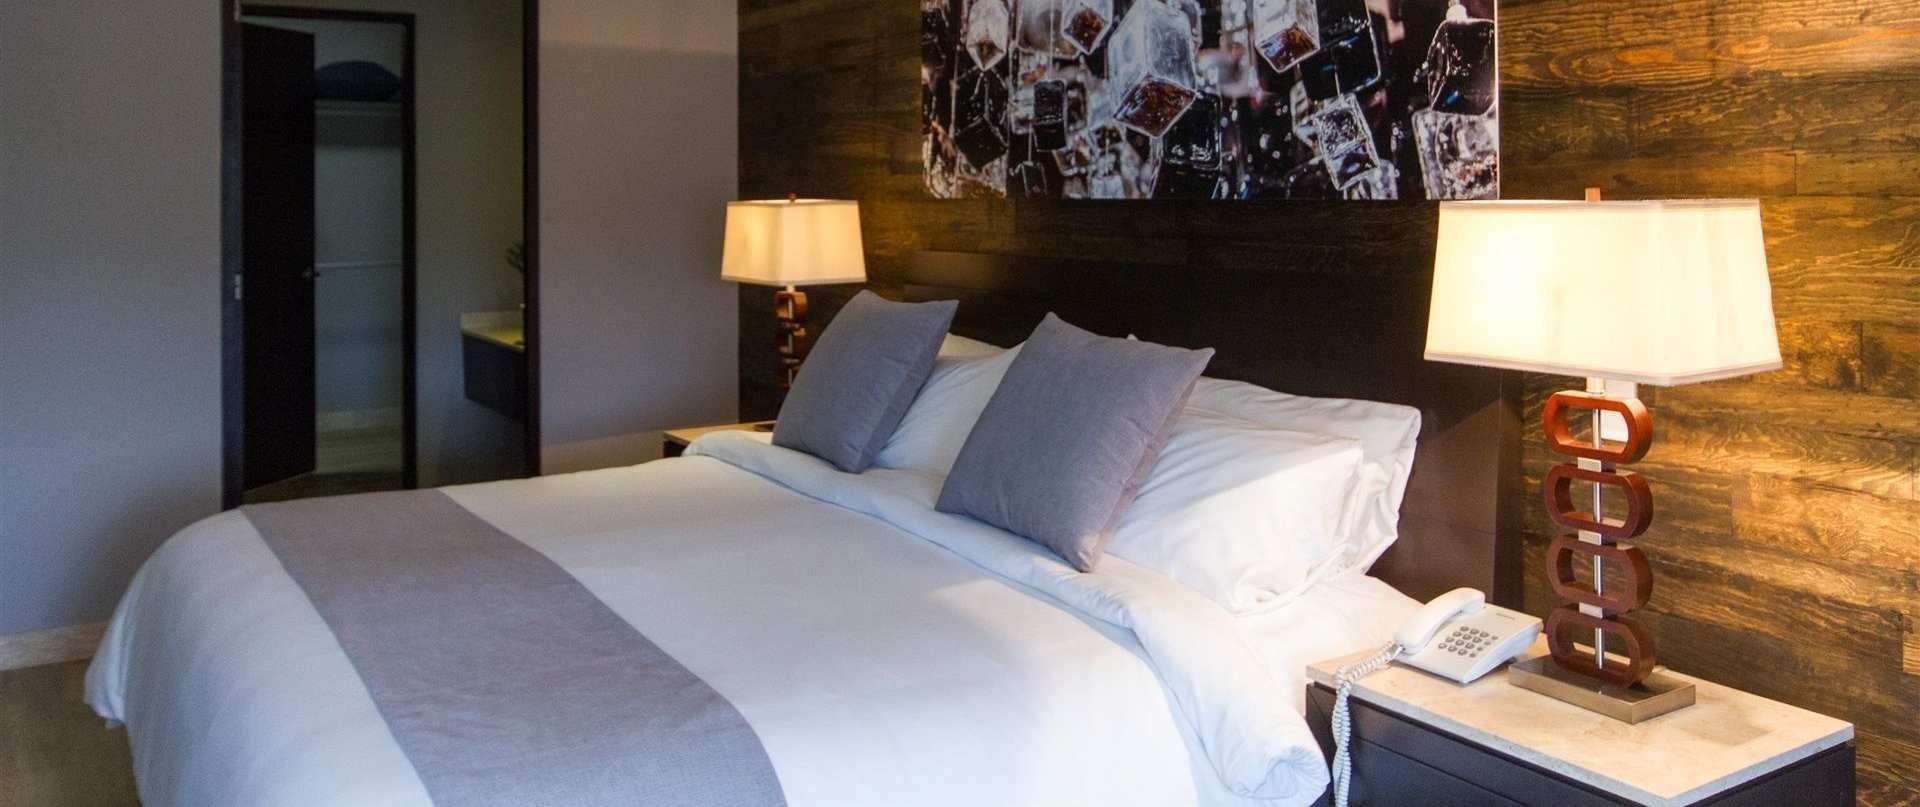 ventura-hotel-and-suites-06-1.jpg